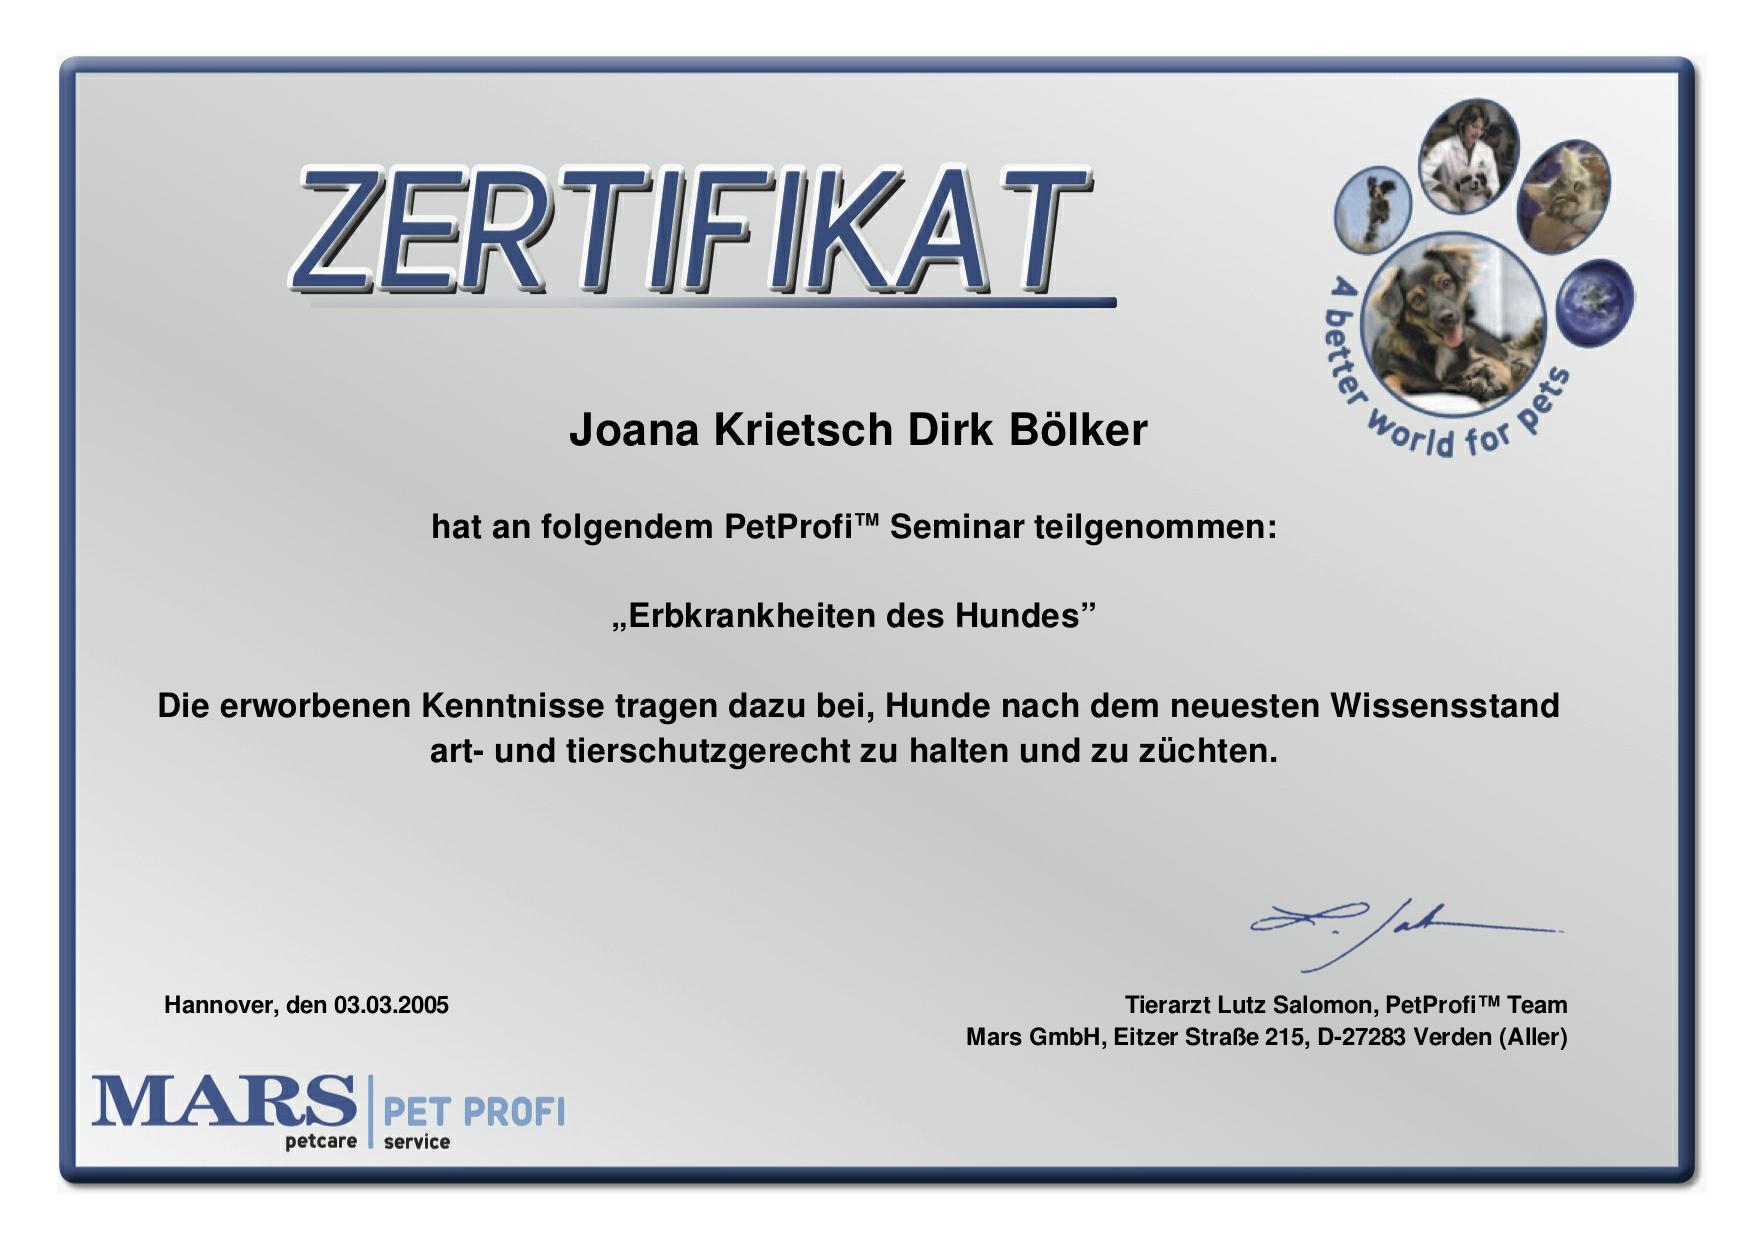 20180605-124936_Zertifikat